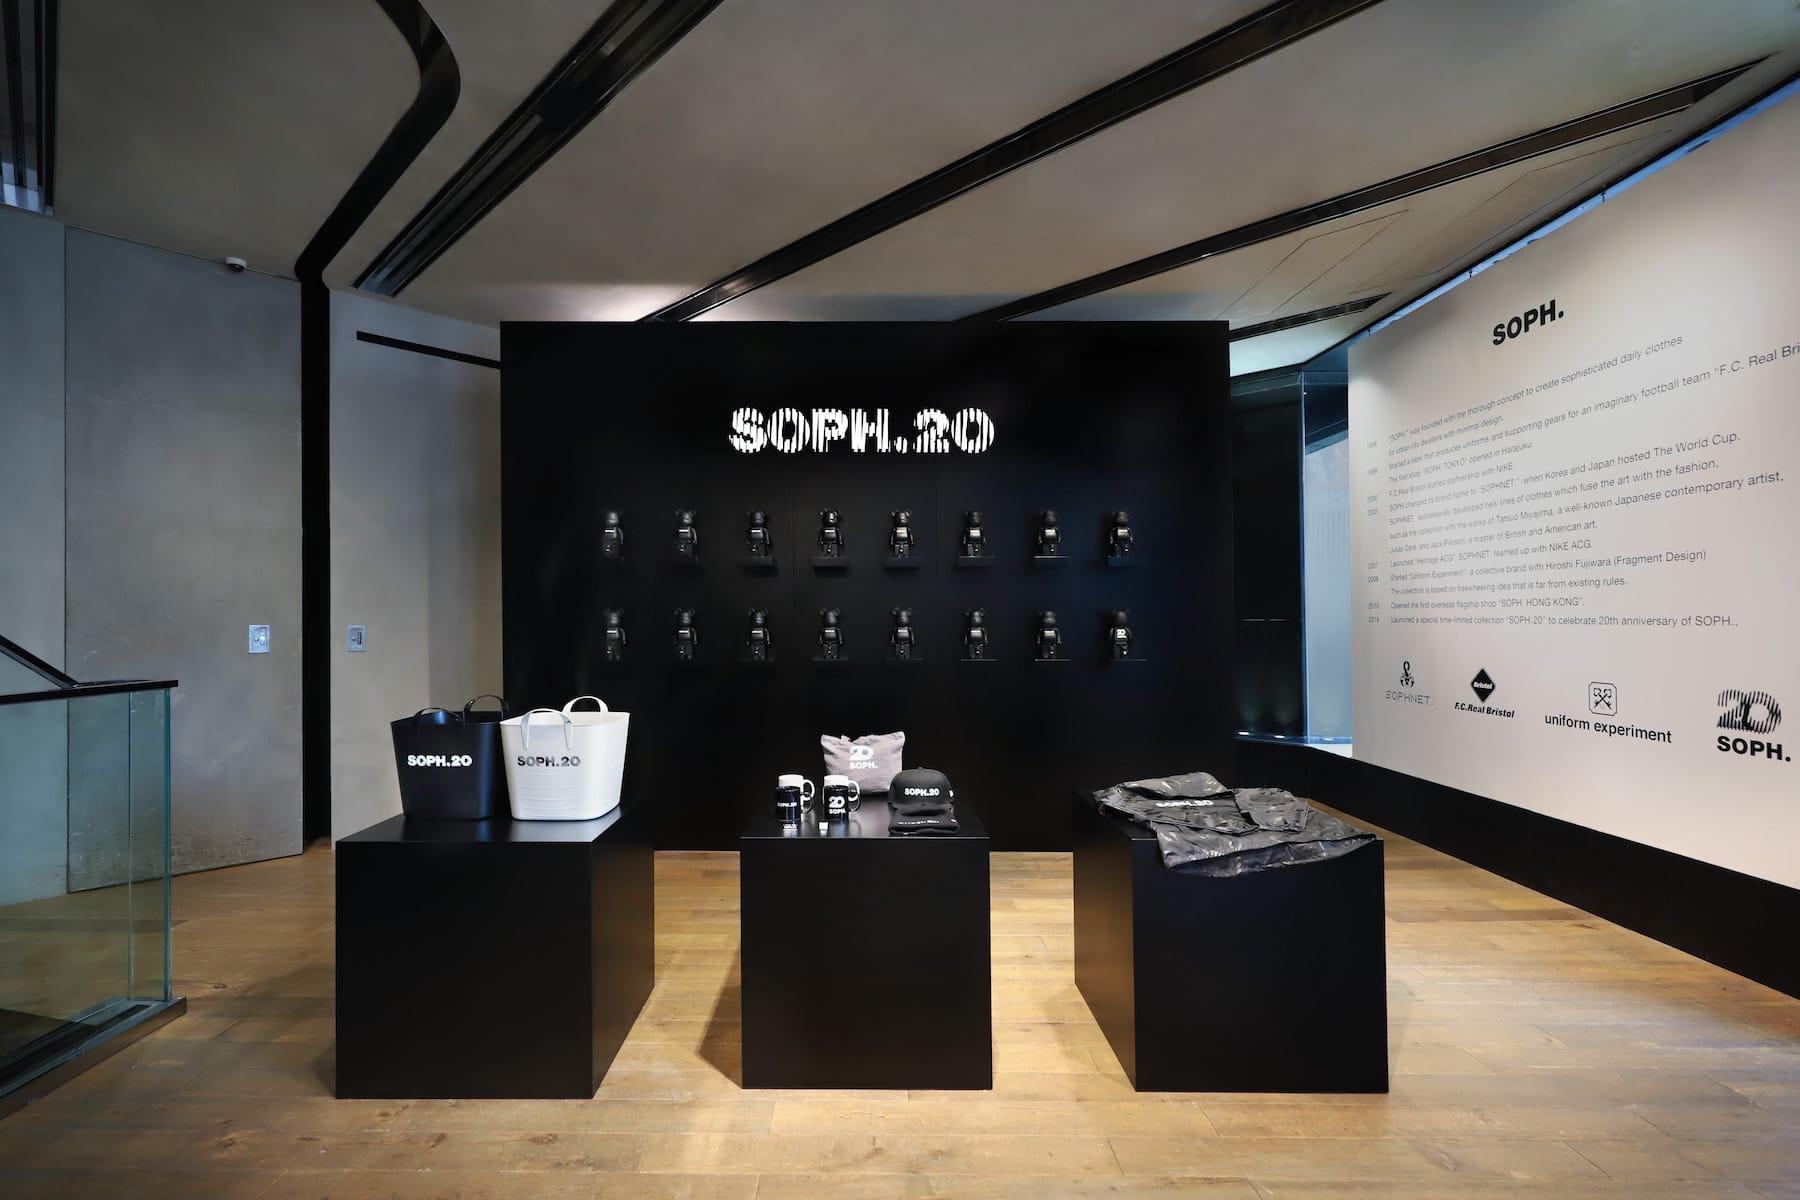 SOPHNET. 20 周年期间限定店开催